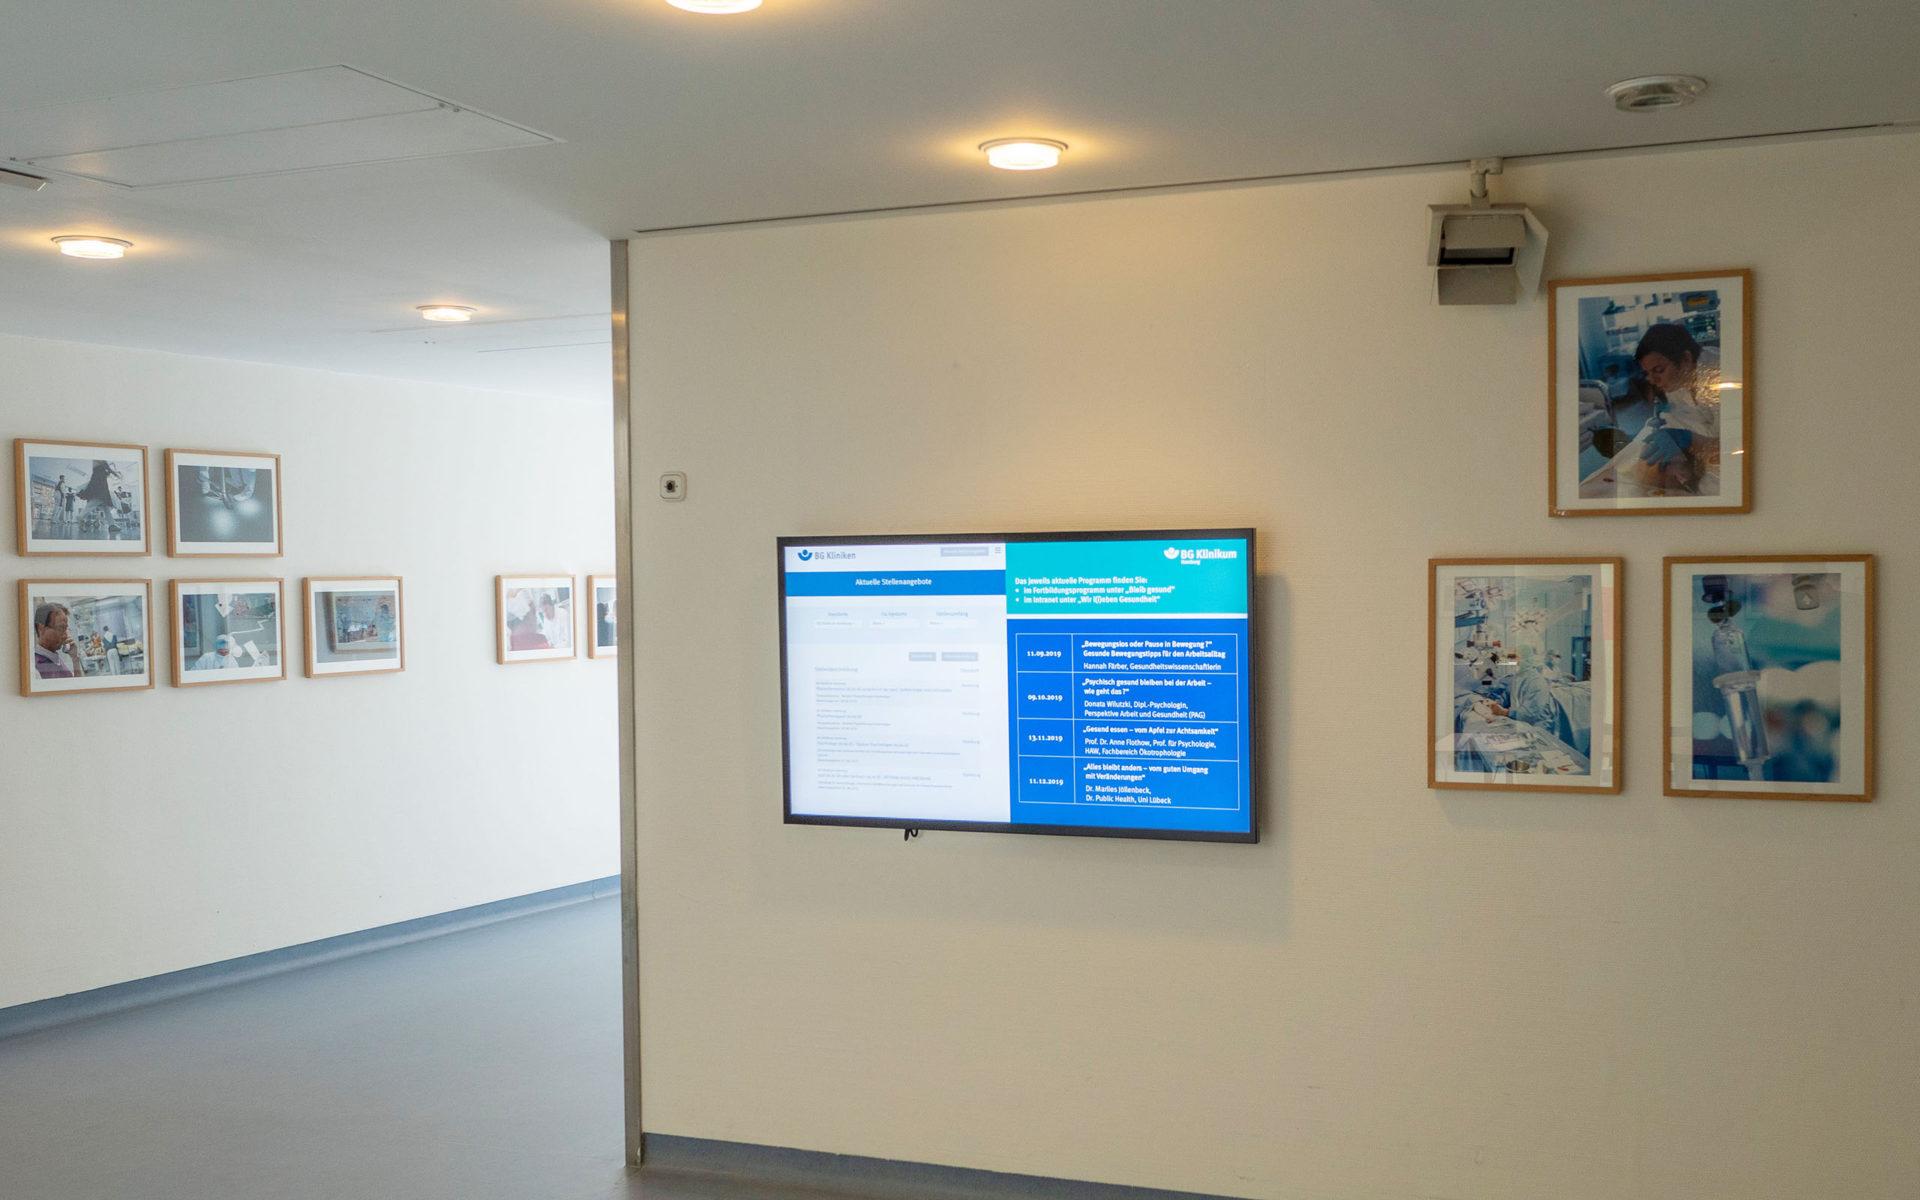 Galerie mit Digital Signage-im BG Klinikum Hamburg